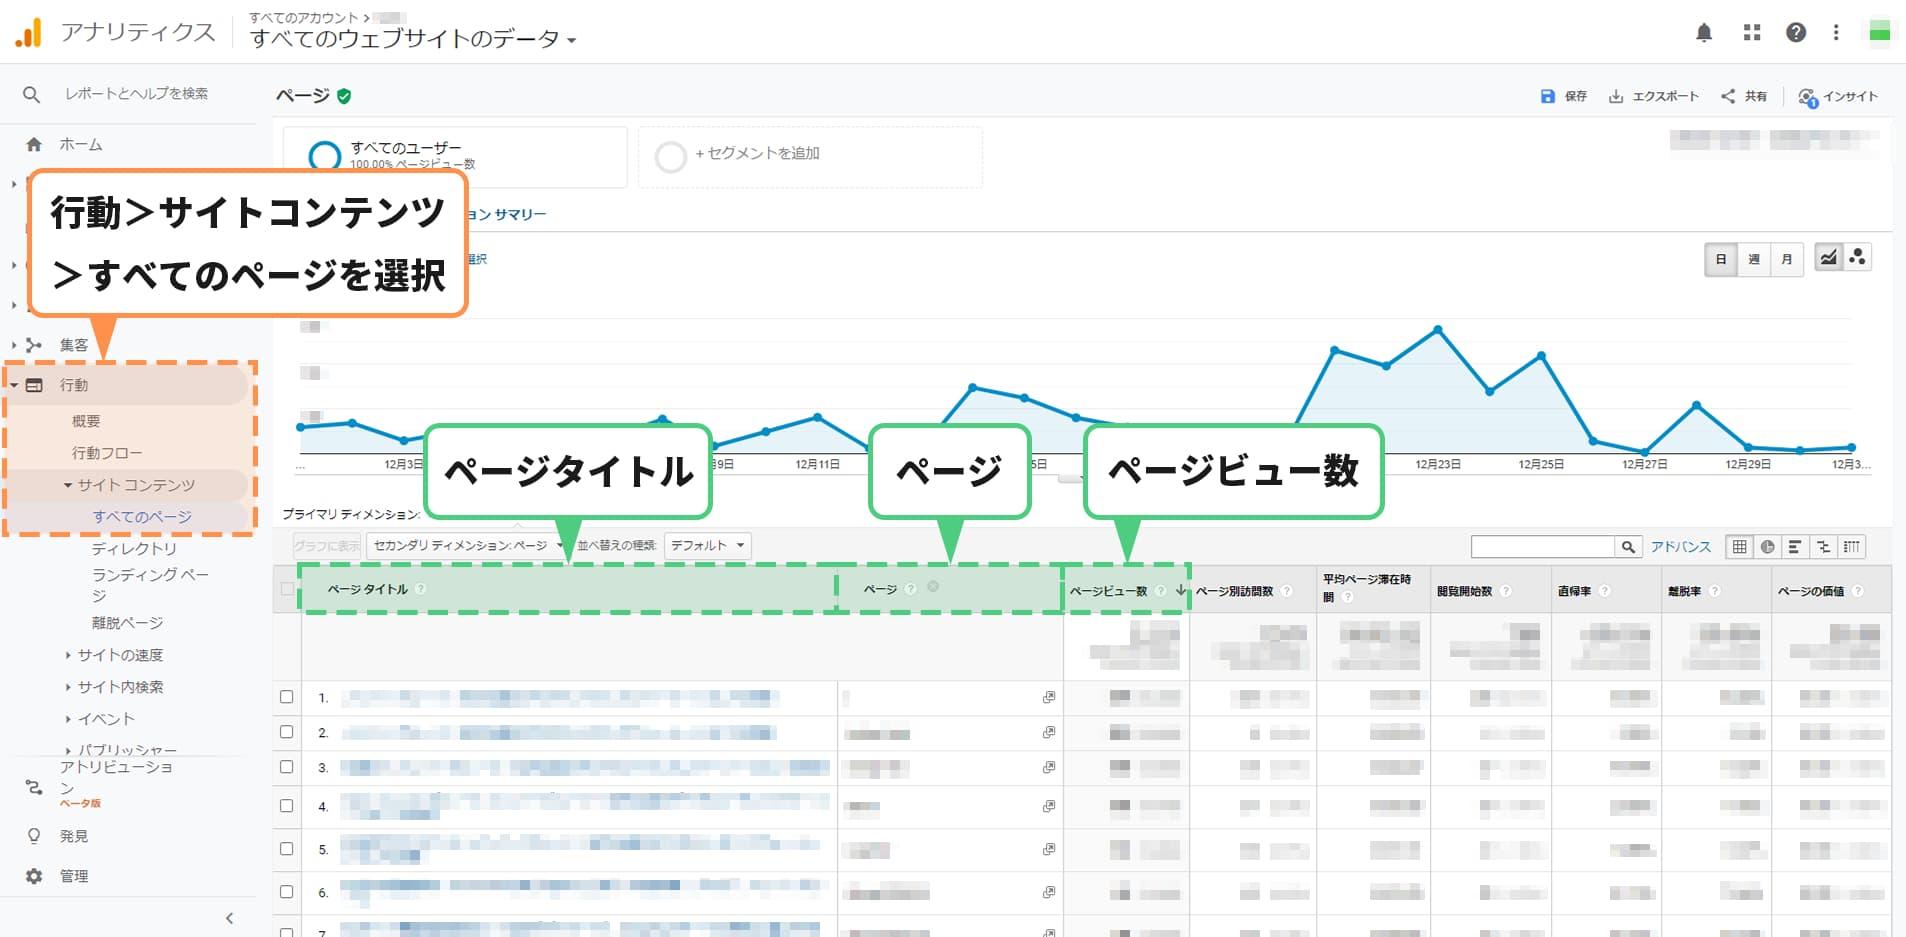 analysis_4points_img3